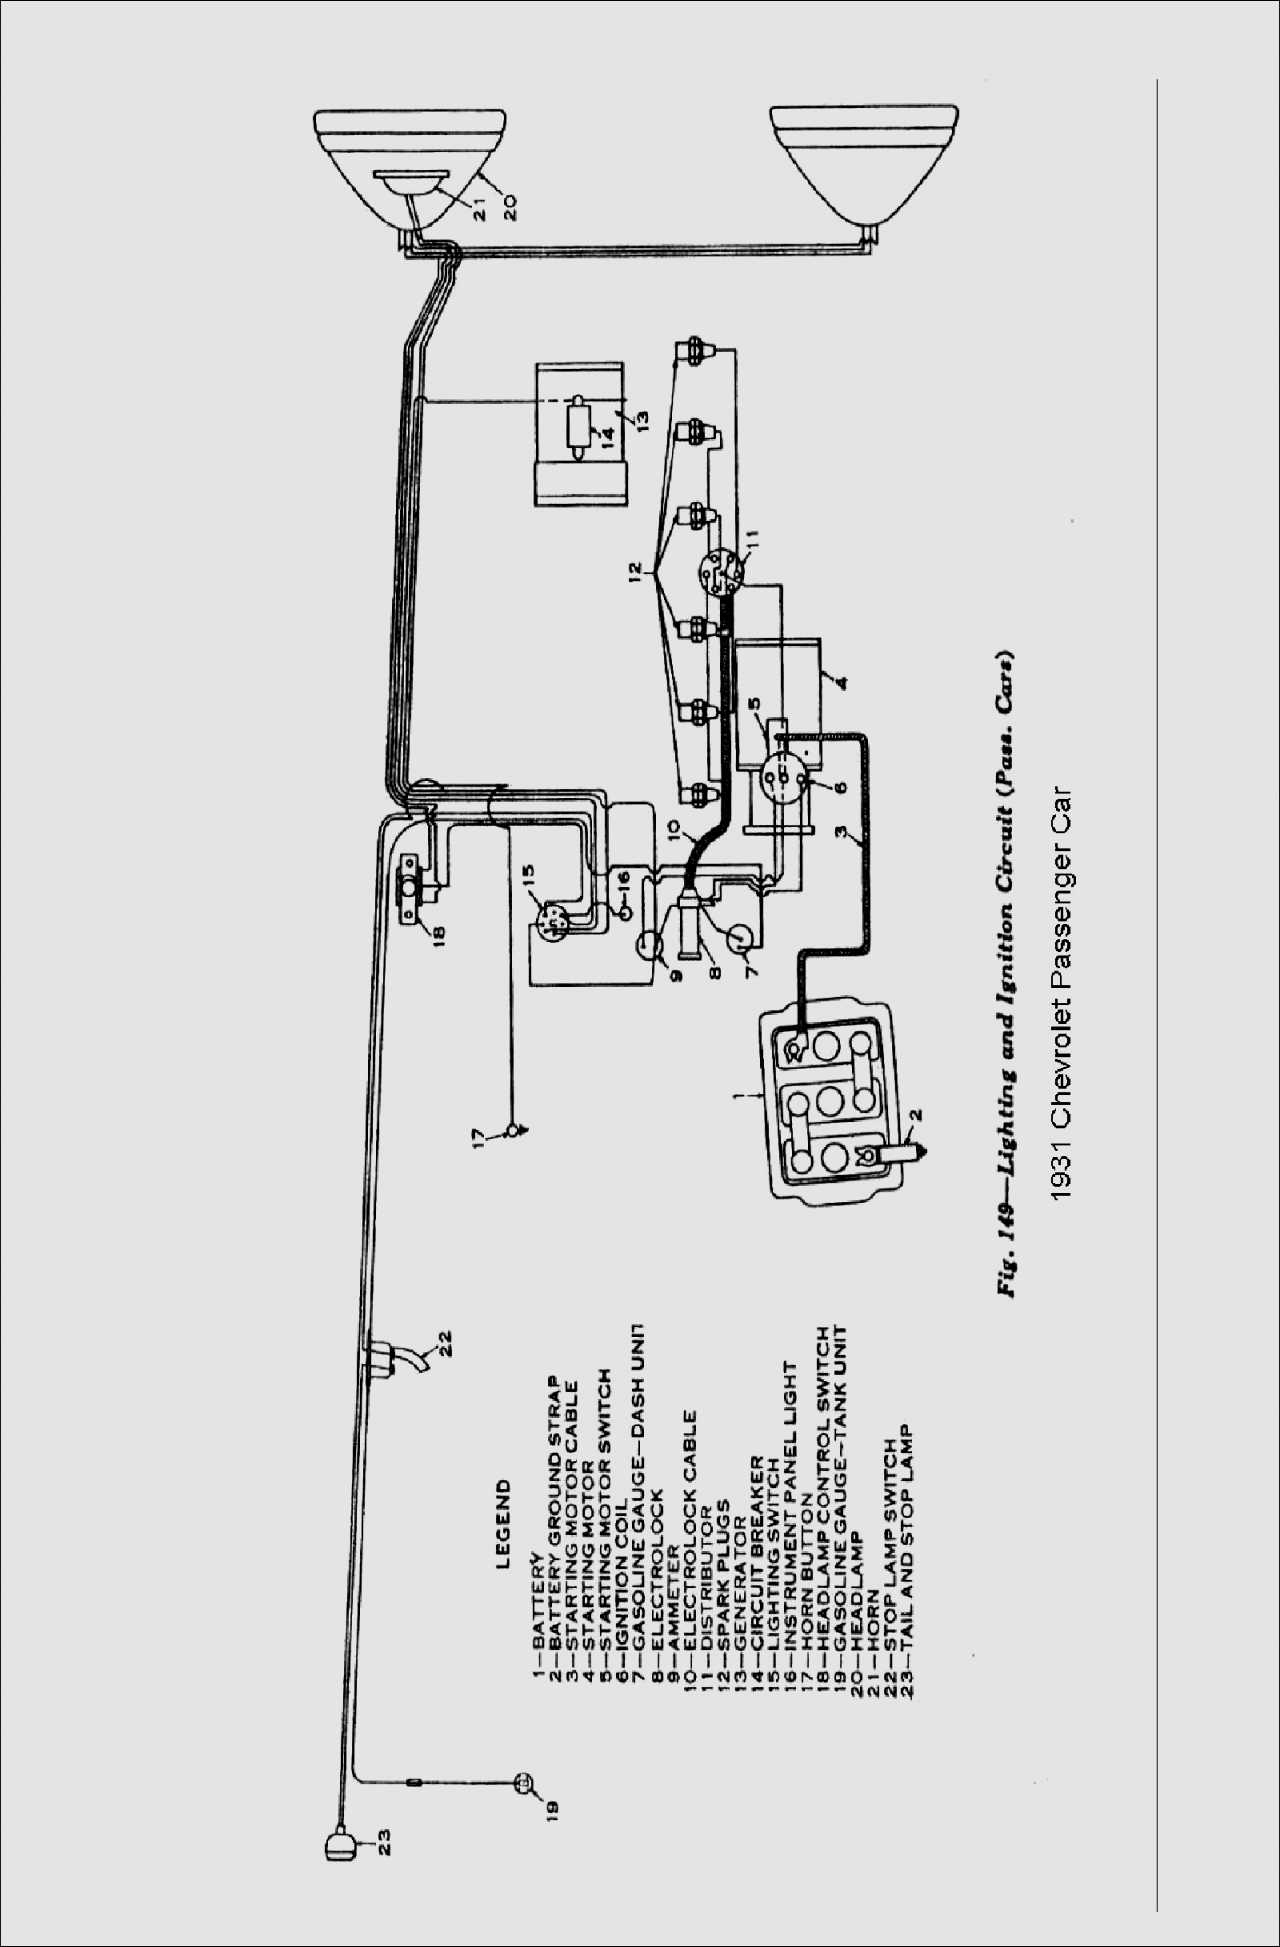 Train Horn Schematic | Manual E-Books - Train Horn Wiring Diagram